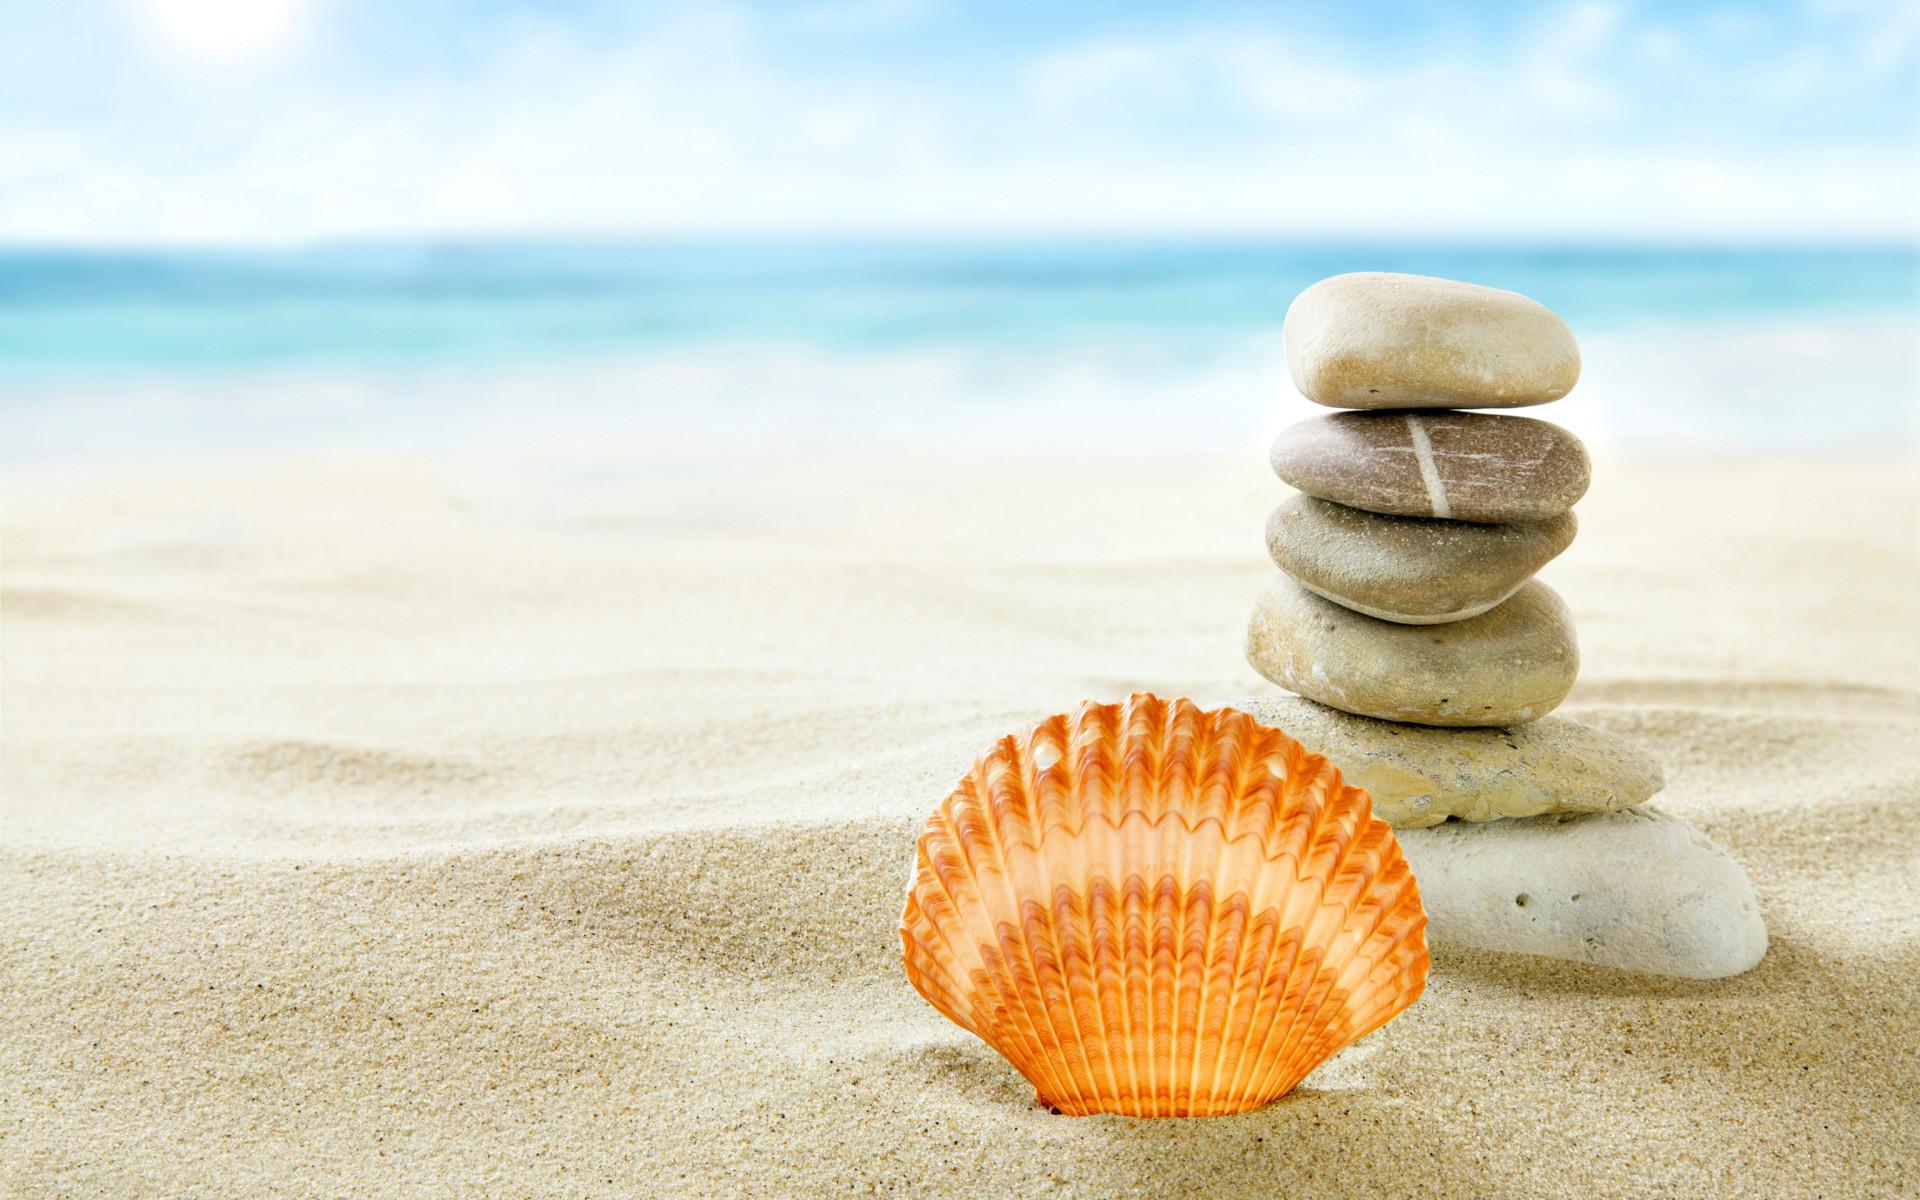 Seashell Desktop Wallpaper 54 Images HD Wallpapers Download Free Images Wallpaper [1000image.com]